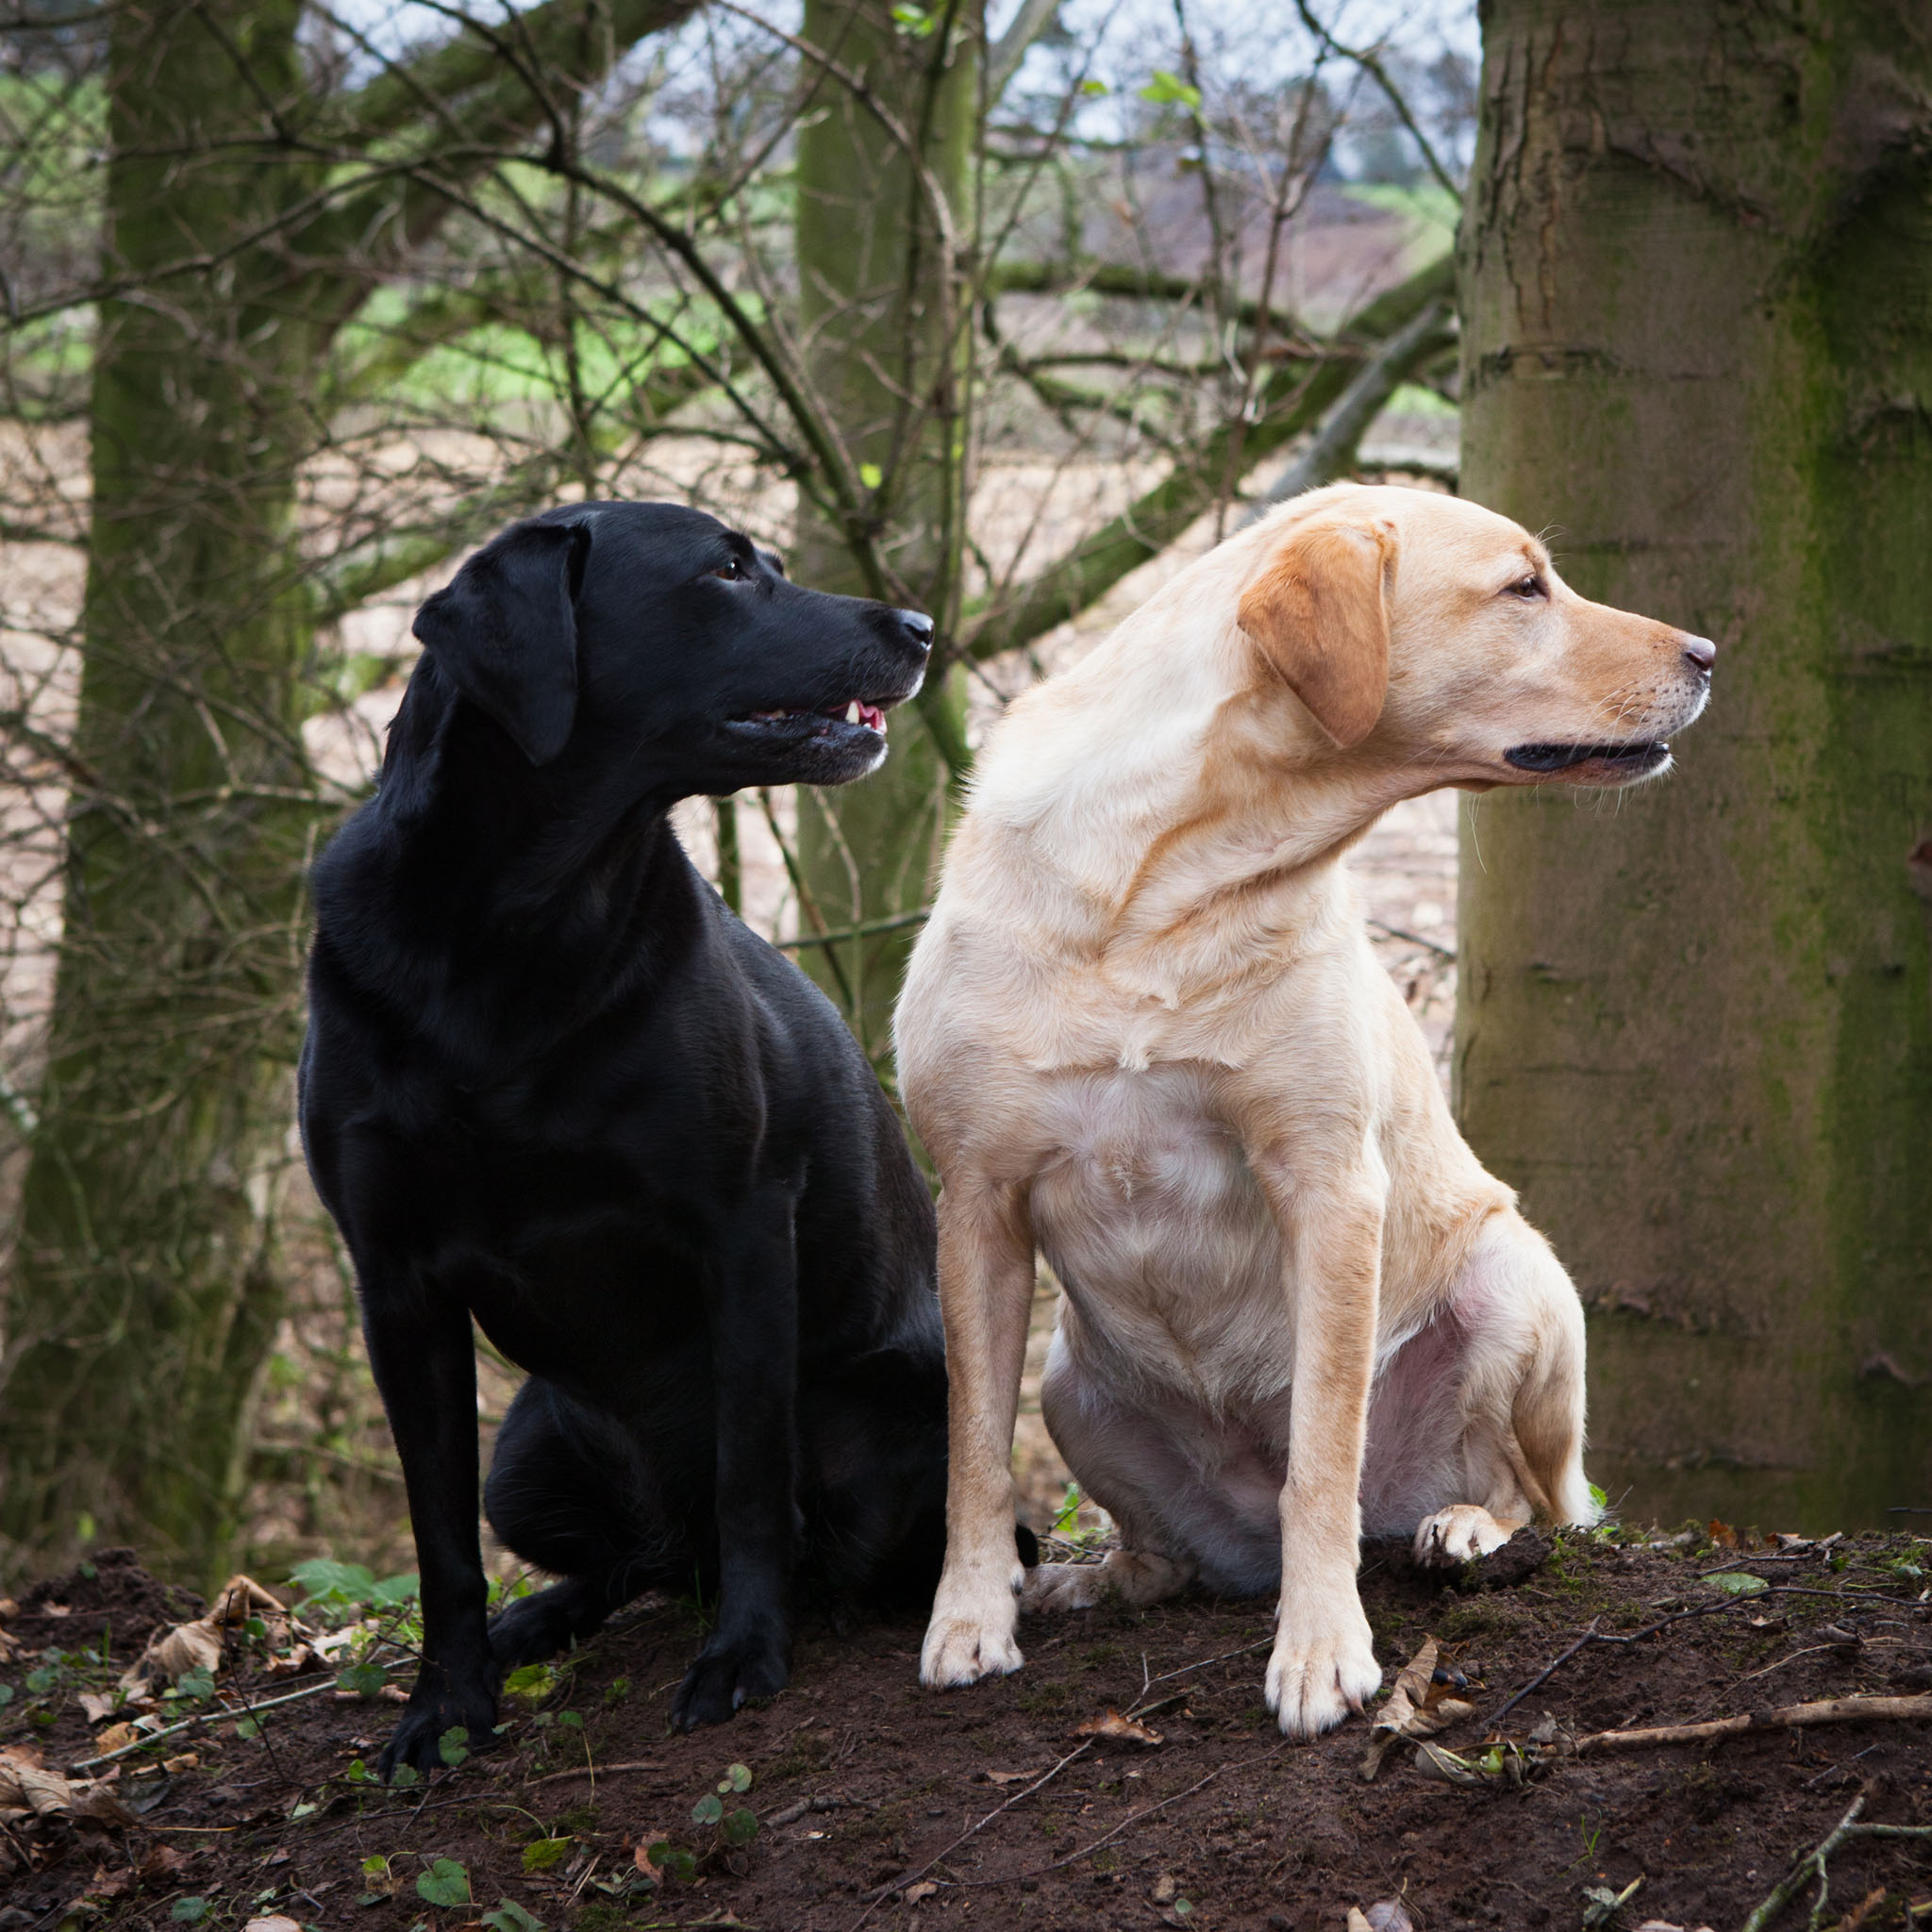 Pet portrait photography of a golden Labrador and black Labrador in Delamere Forest